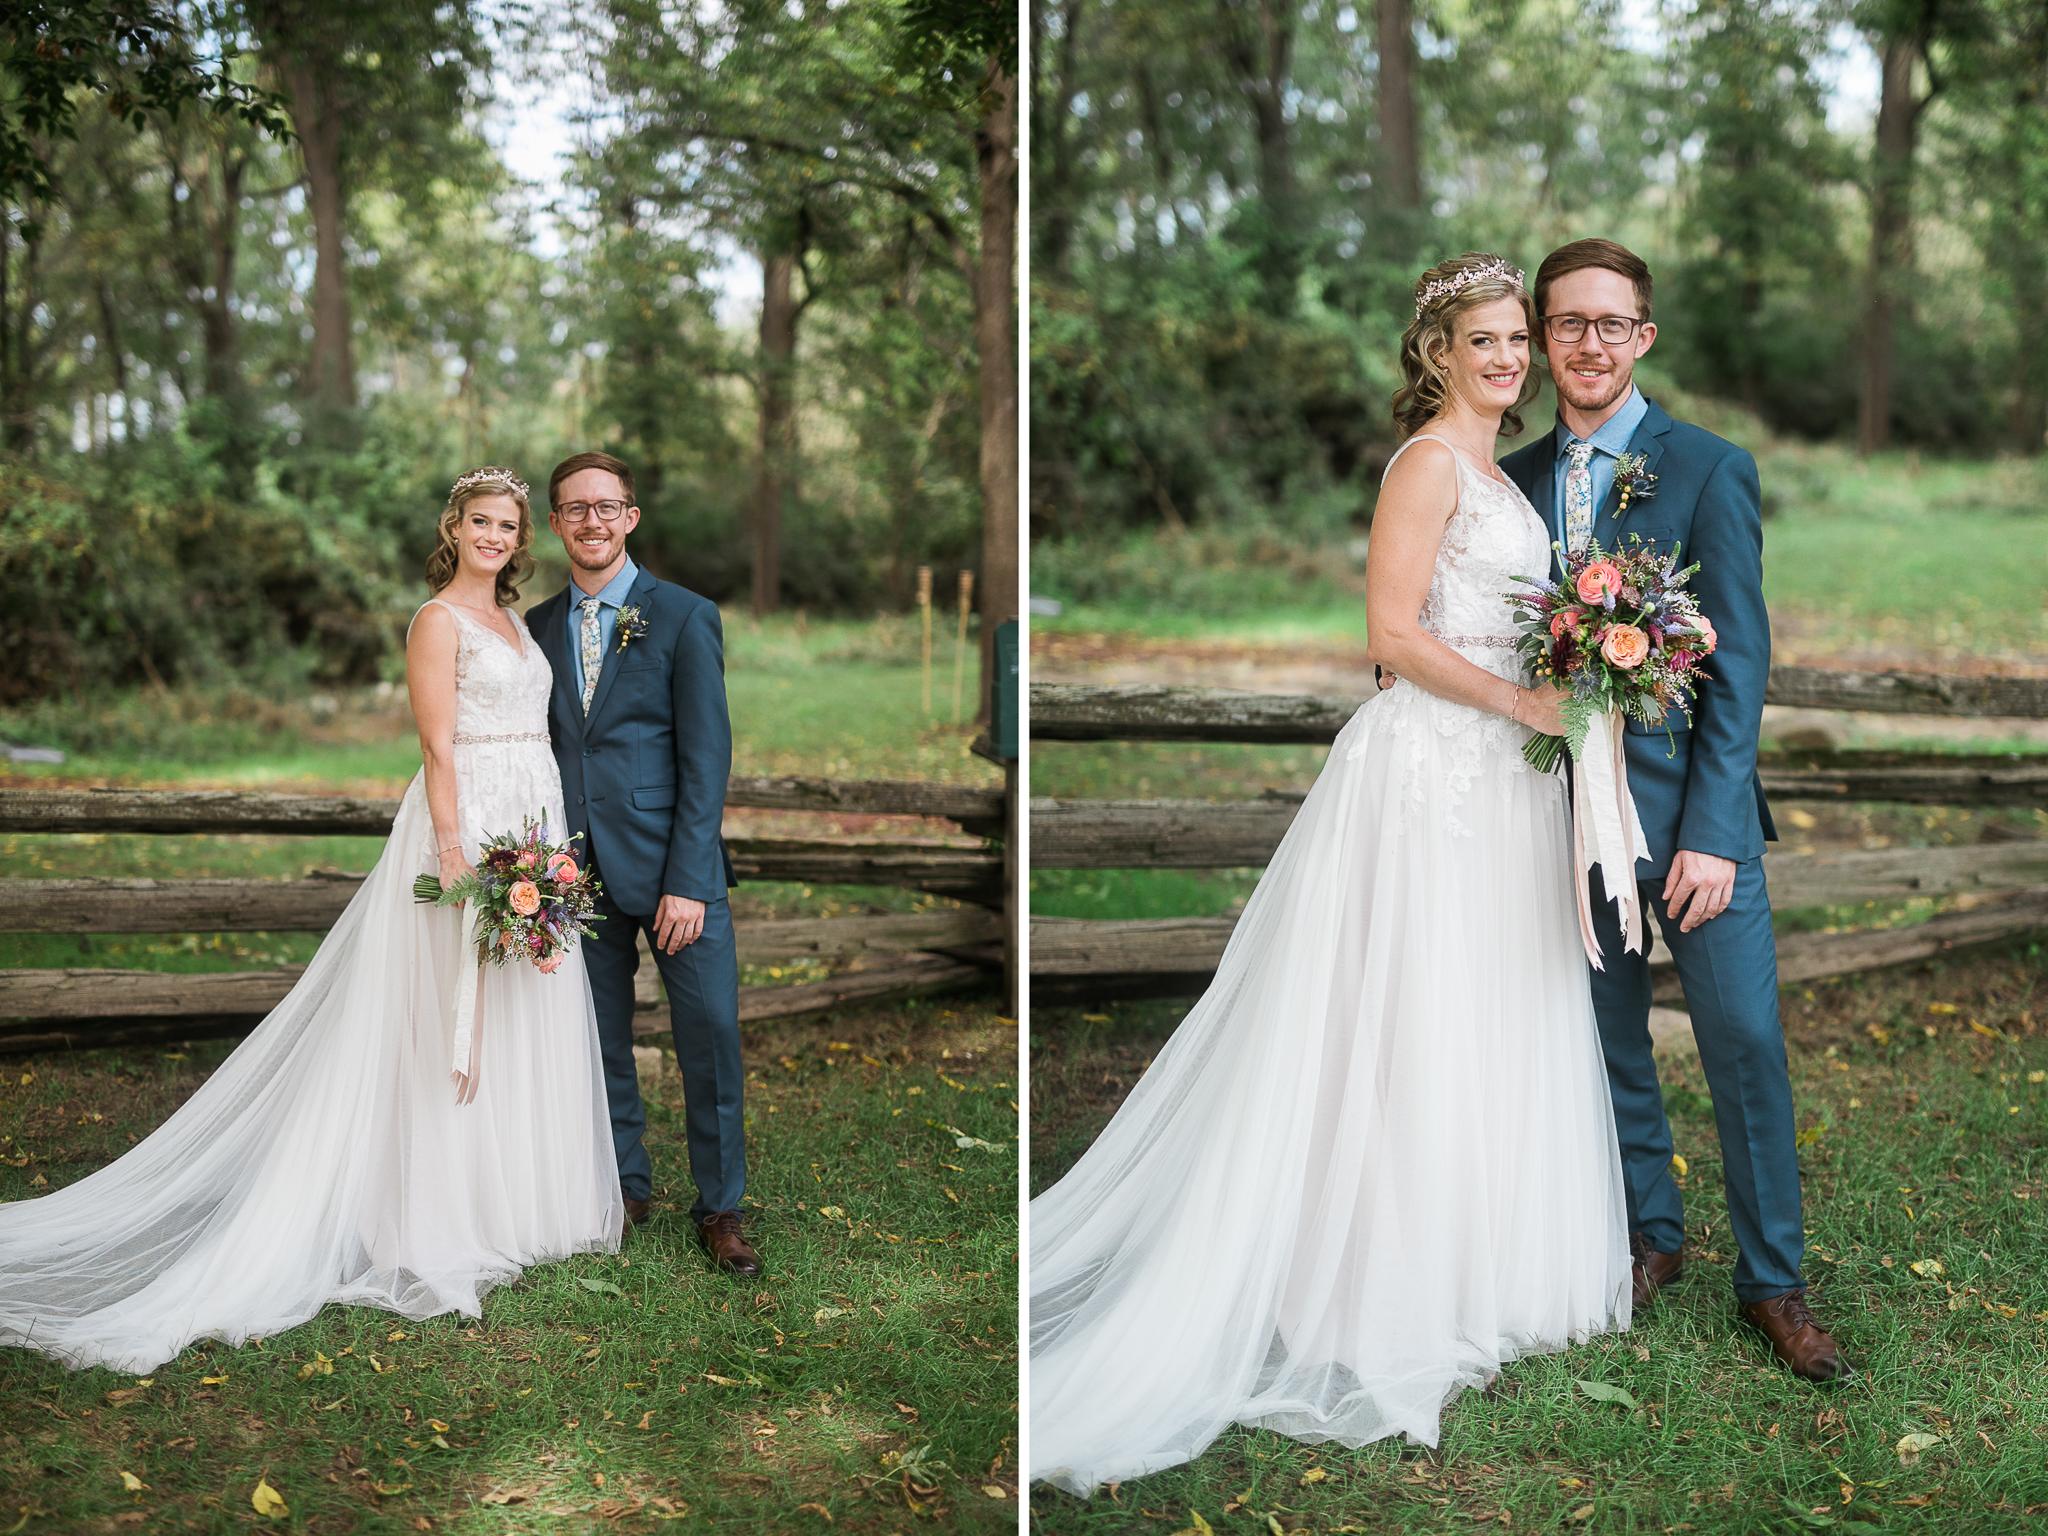 Paoli-Mill-wedding-summer-Wisconsin_053.jpg